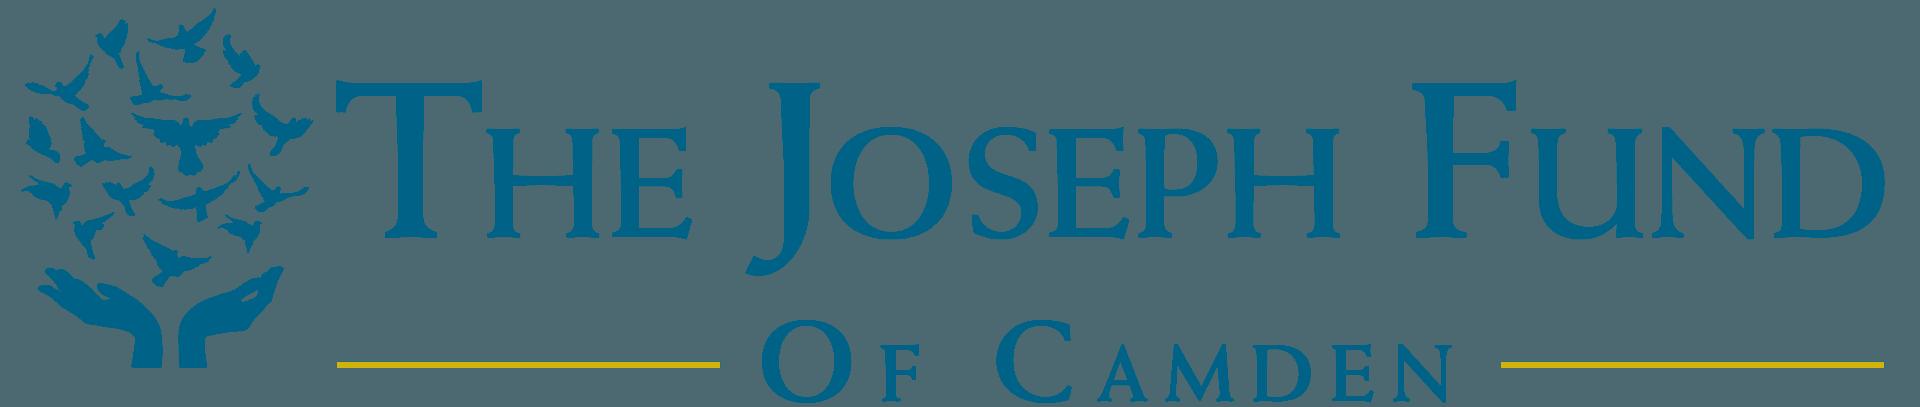 Joseph Fund of Camden logo